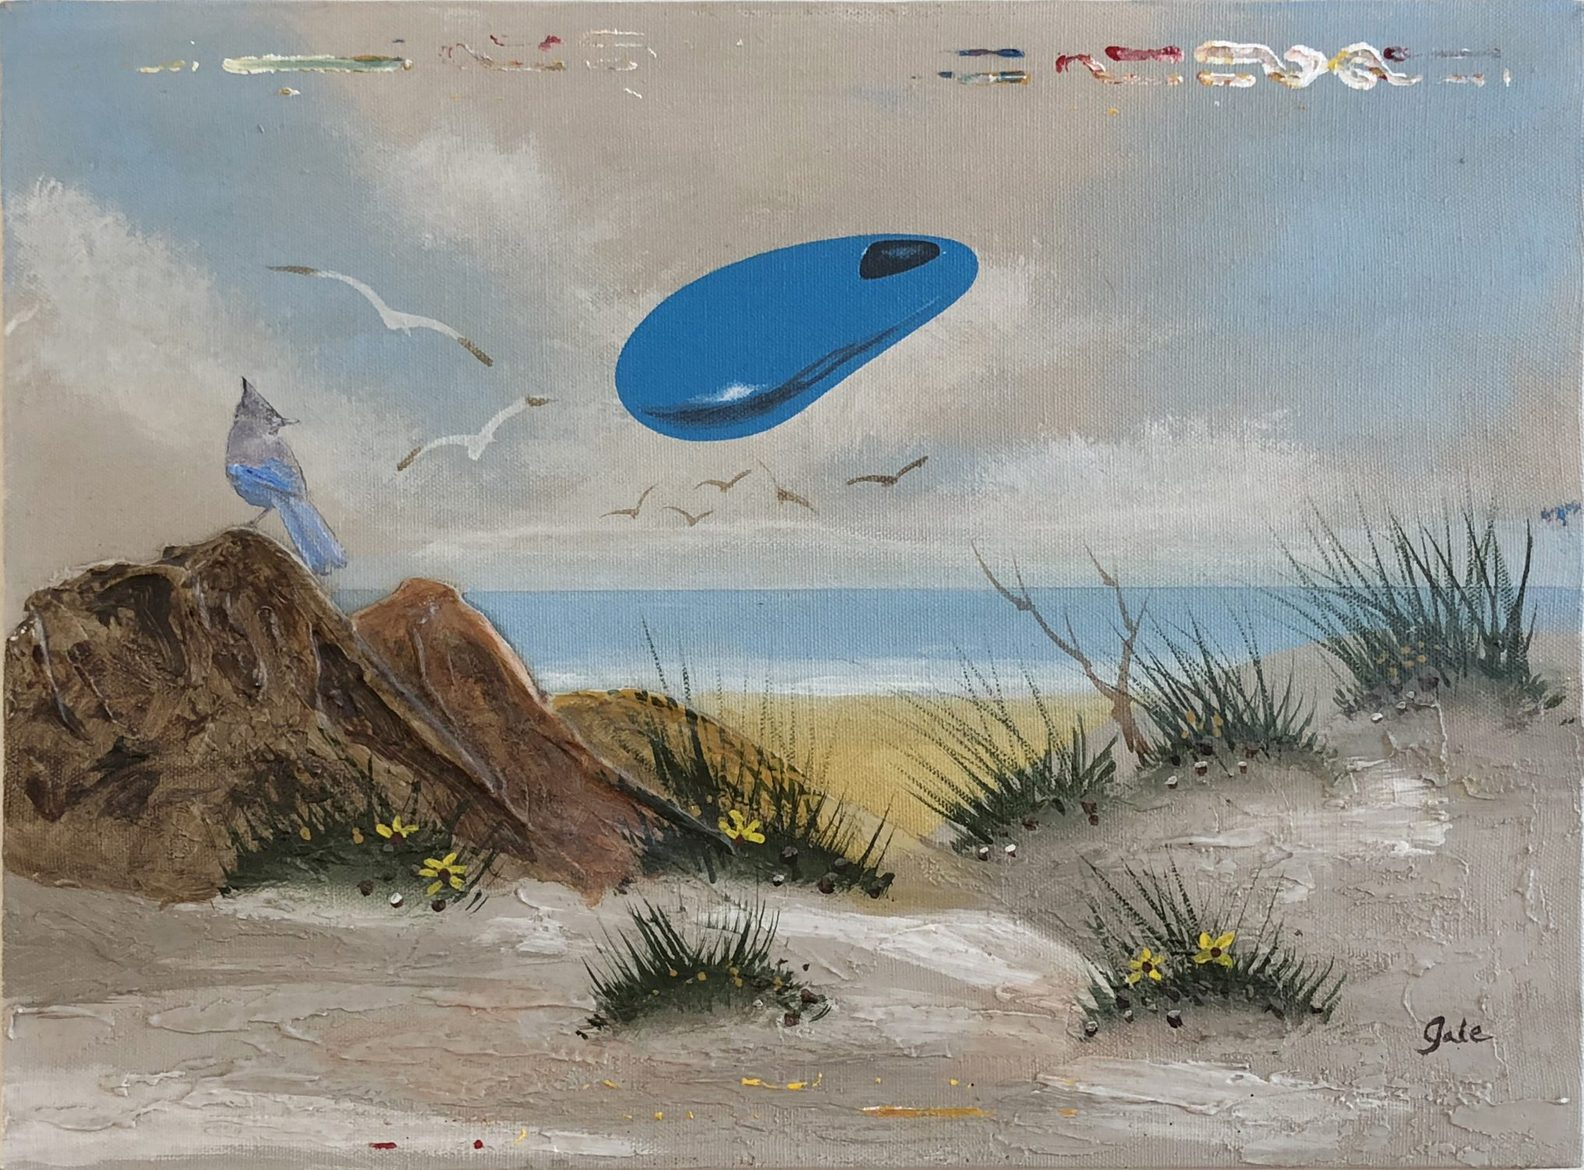 Tim Johnson and Daniel Bogunovic, 'Untitled', 2019, acrylic on sourced canvas  painting,  30 x 40 cm